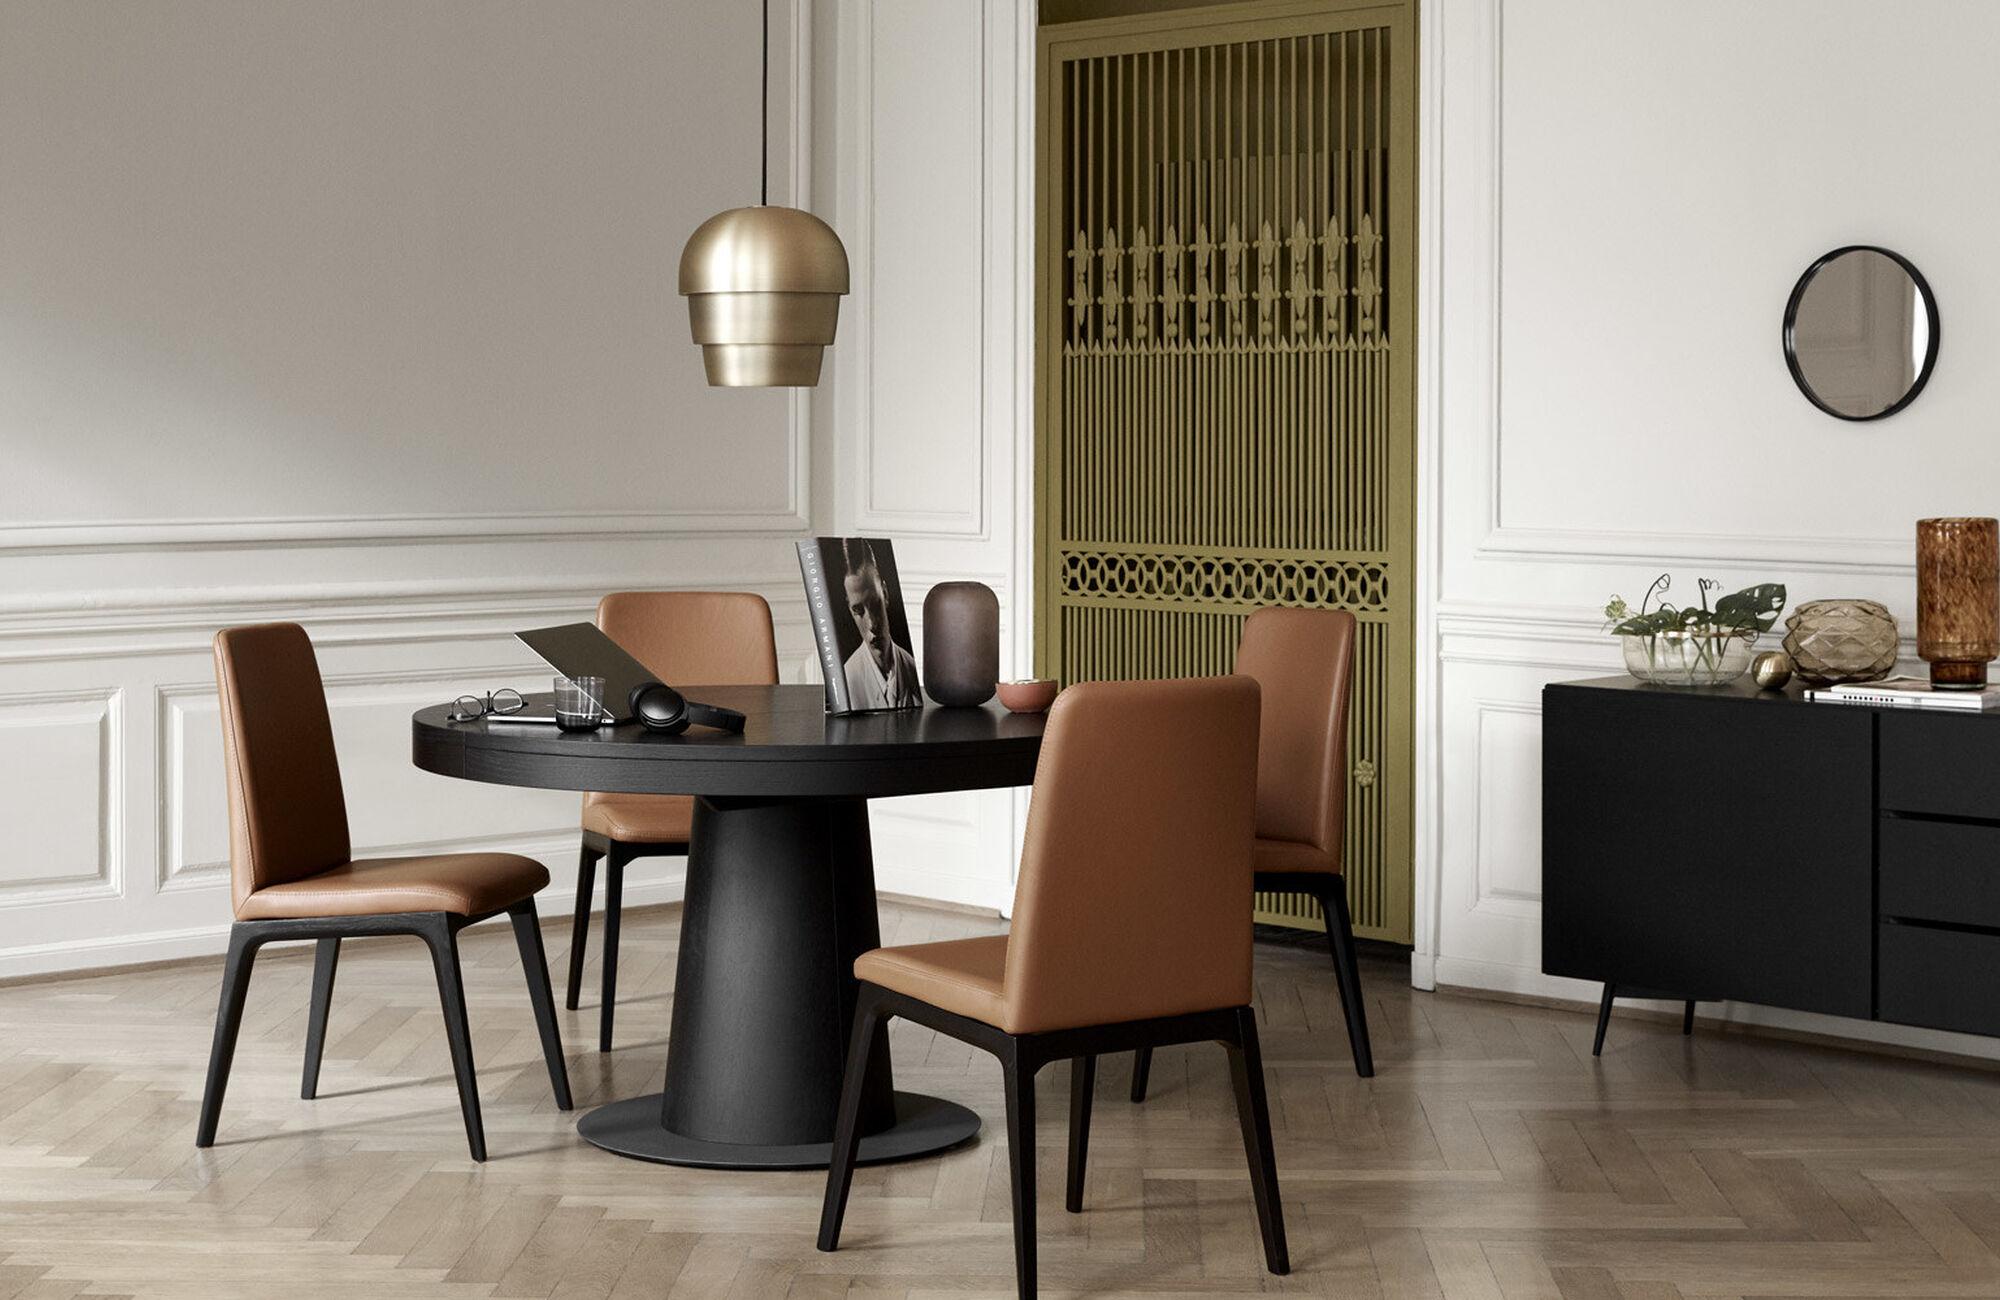 Utmerket Dining tables - Granada table with supplementary tabletop - BoConcept IJ-63